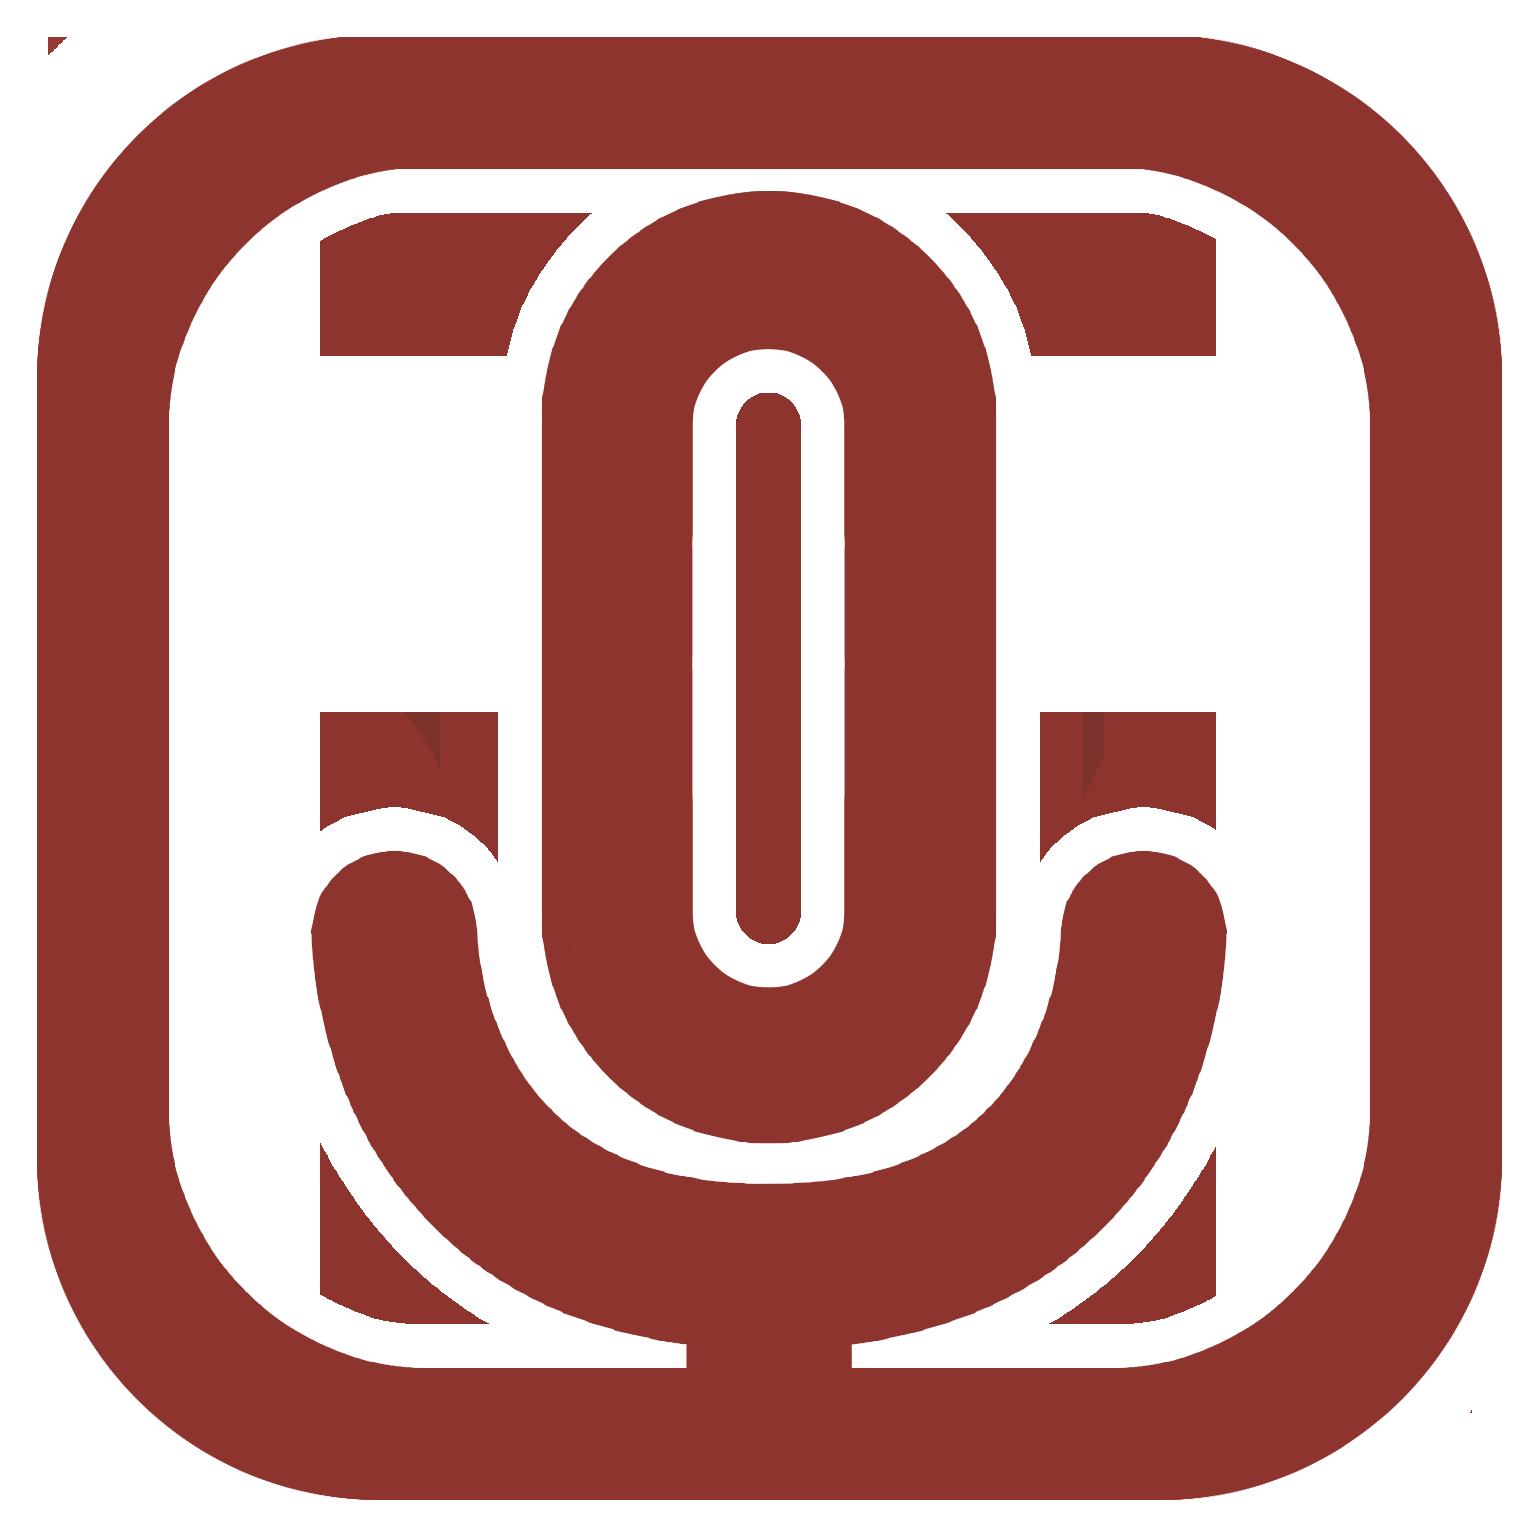 Stikers / Icons / Logos